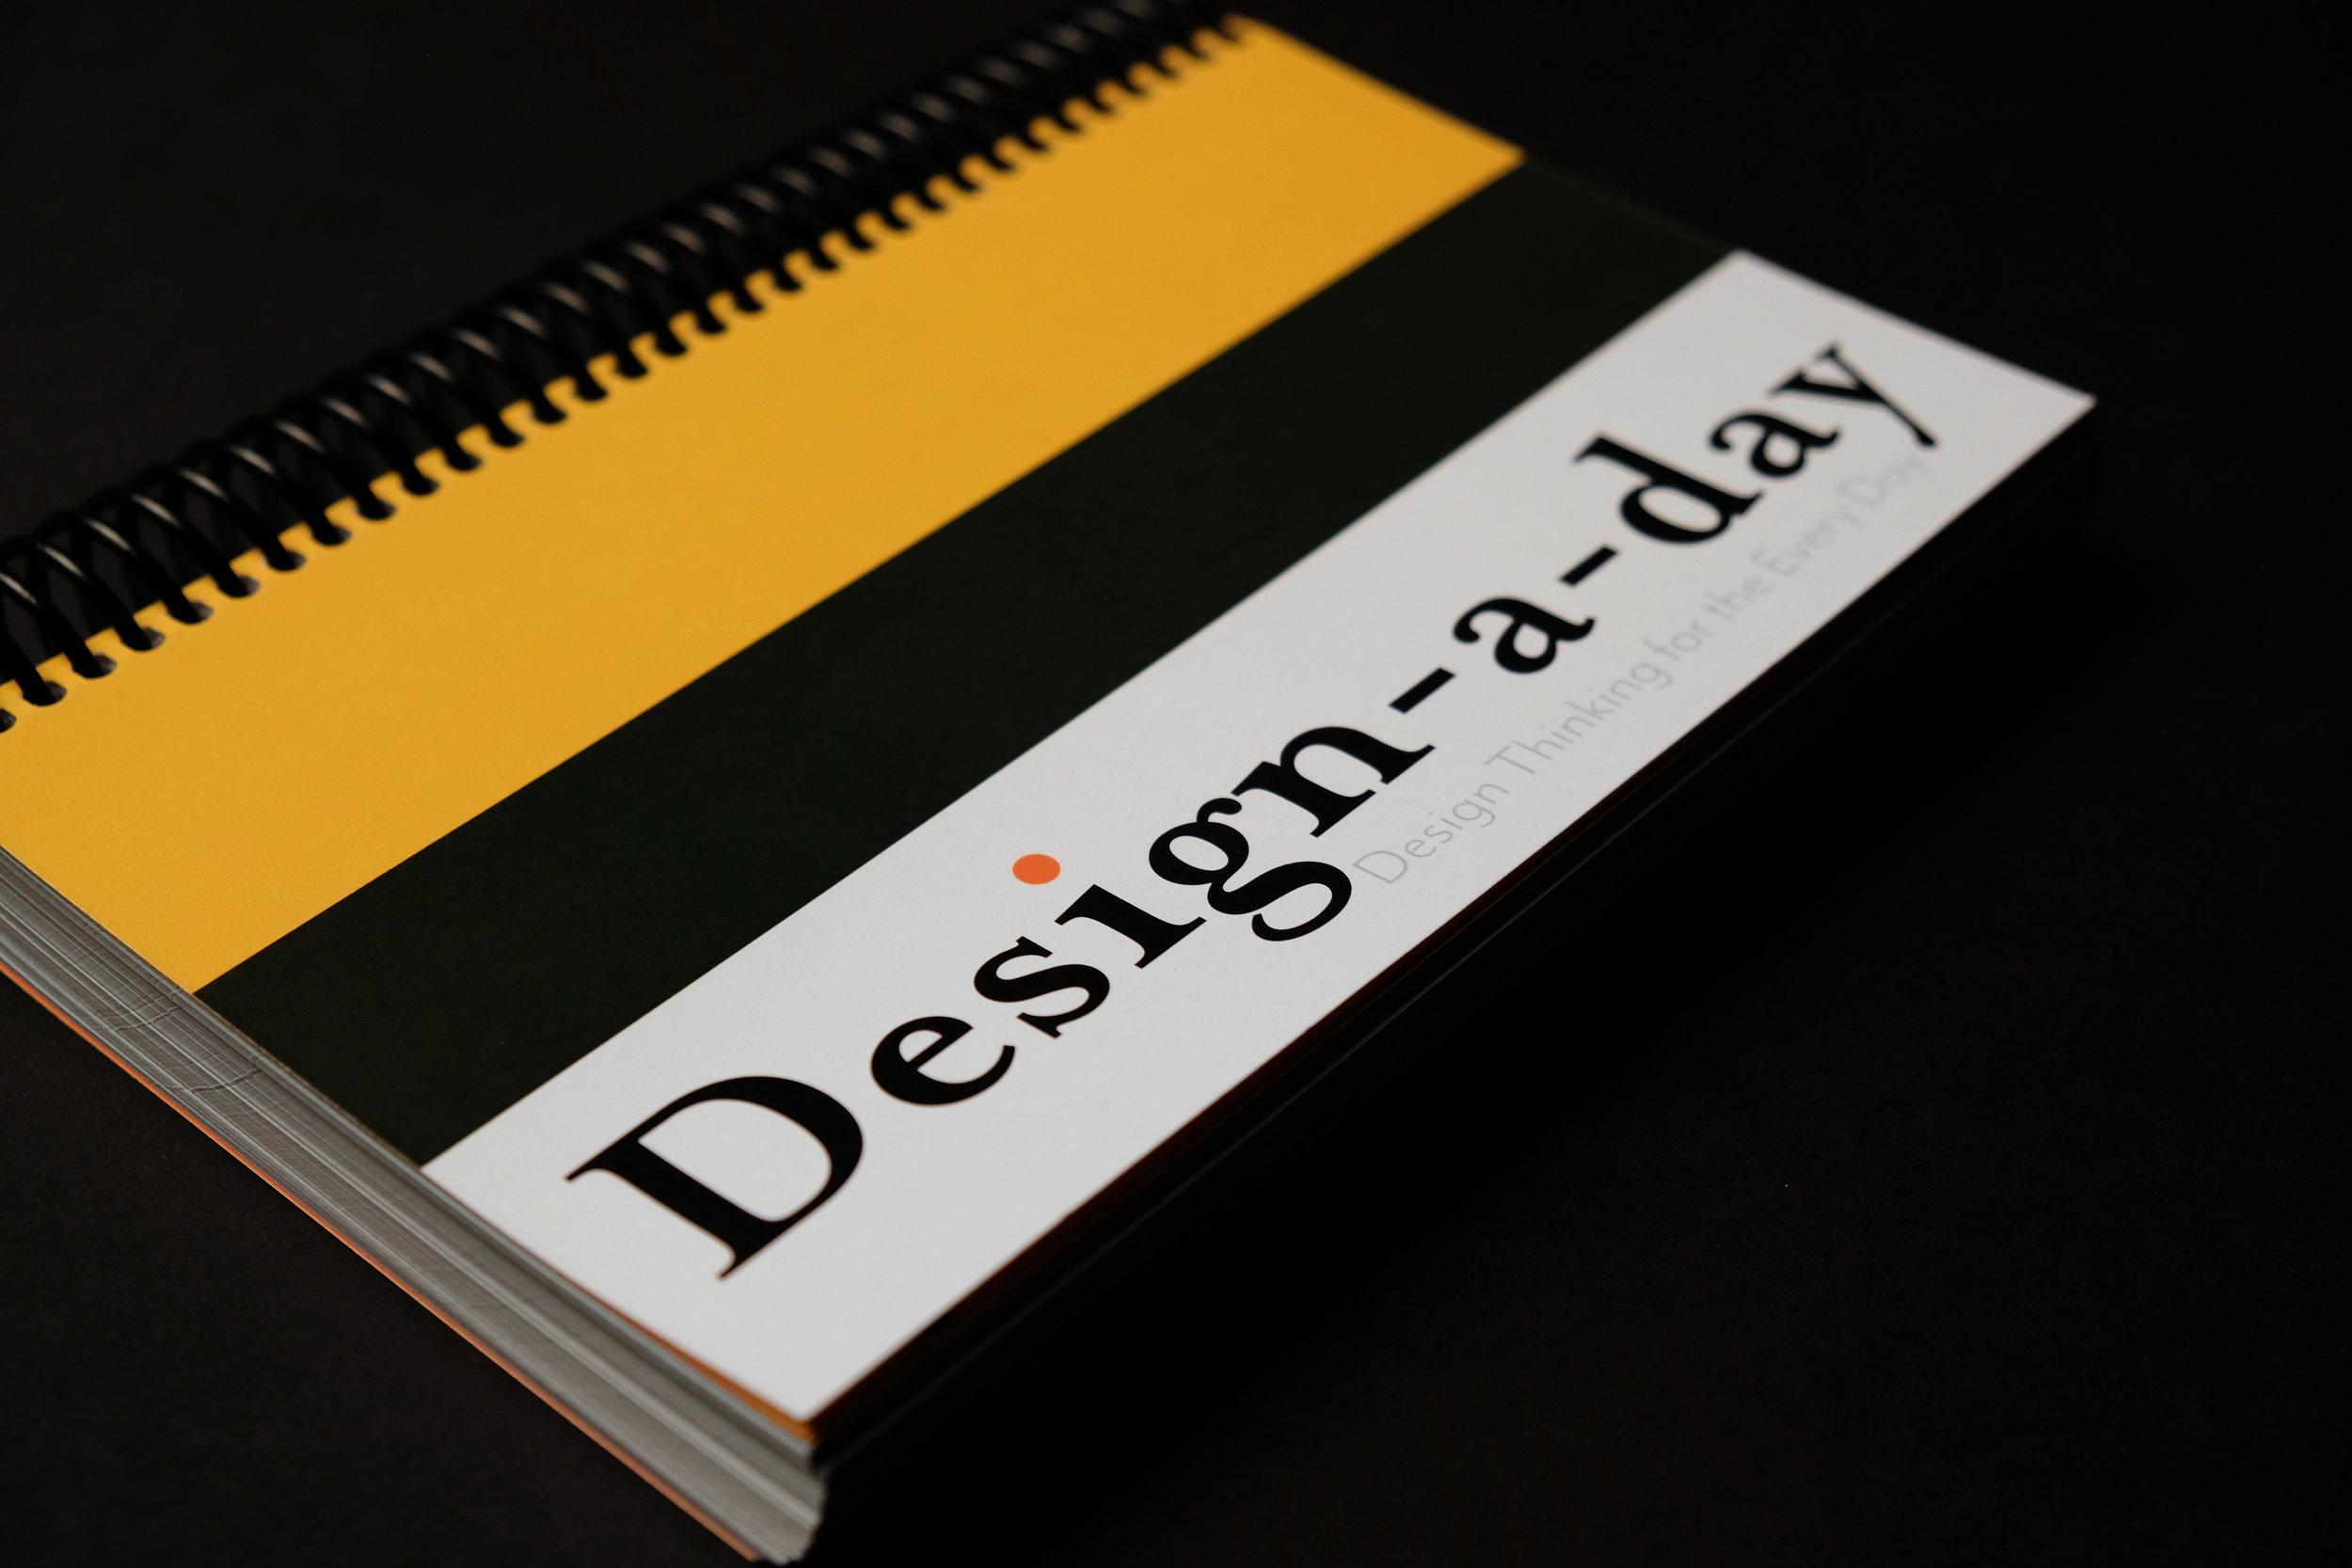 Design_a_day-table shot.JPG